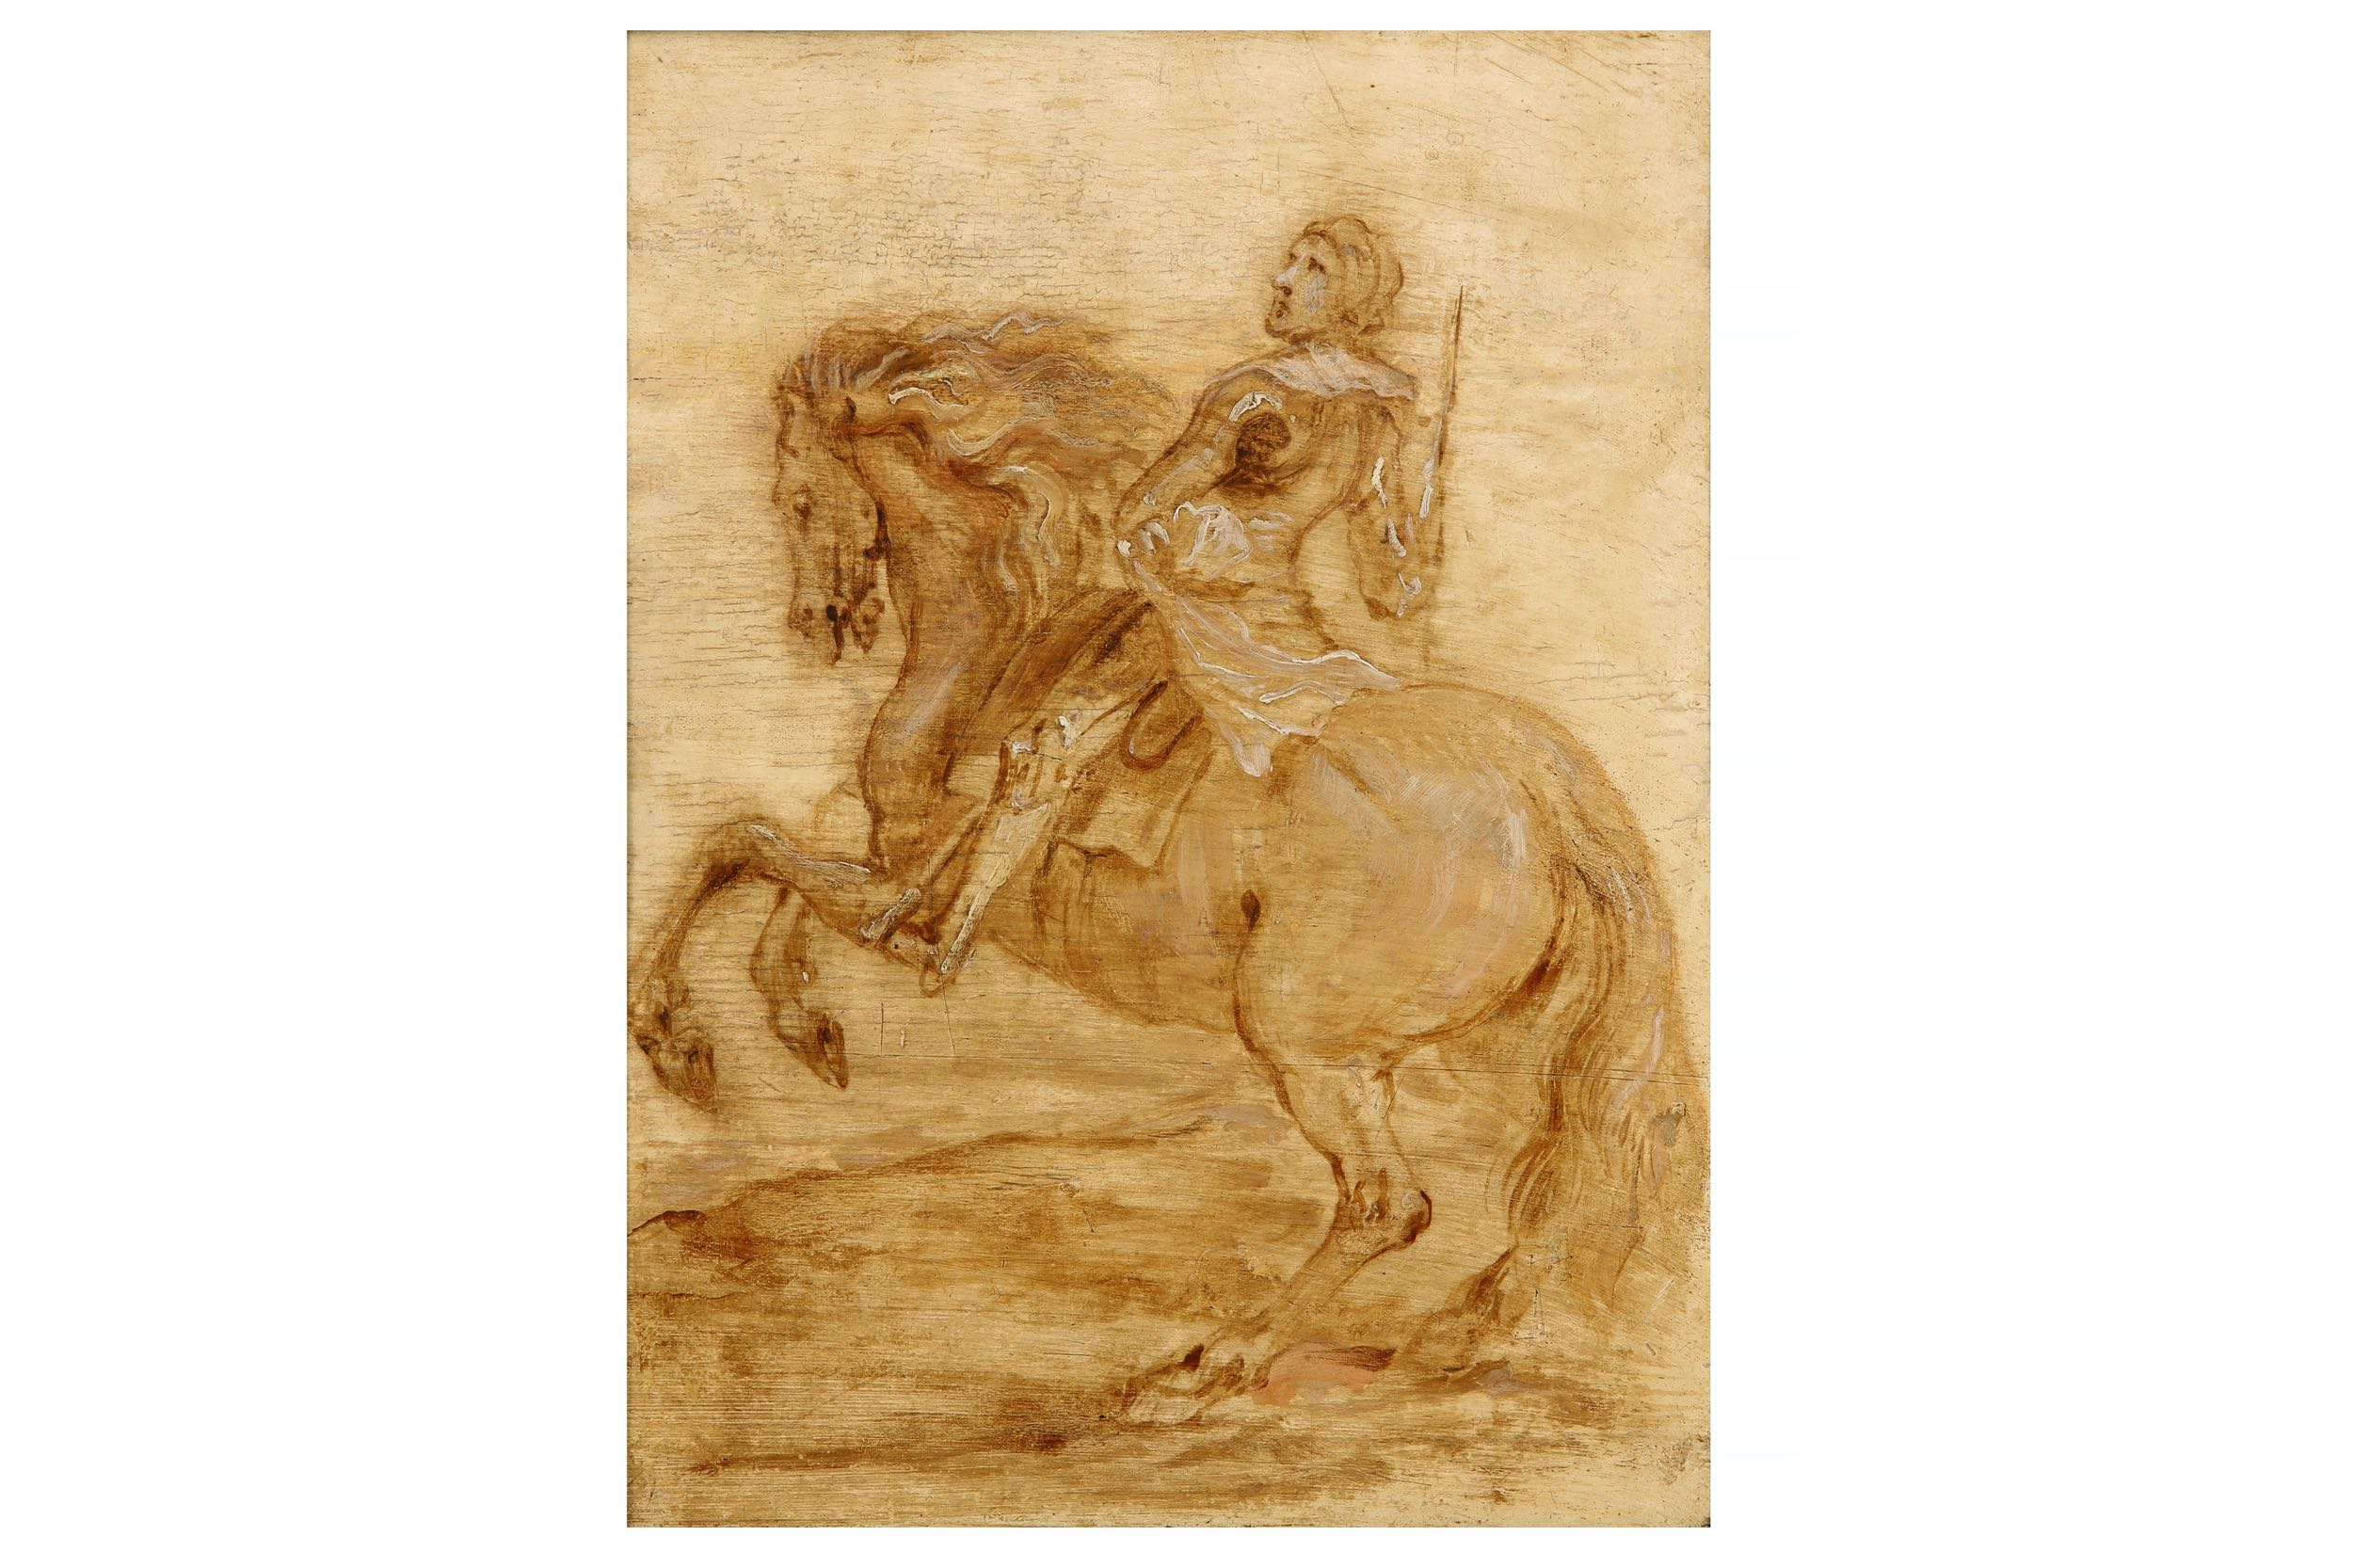 Circle of Sir Anthony Van Dyck, A Knight on horseback